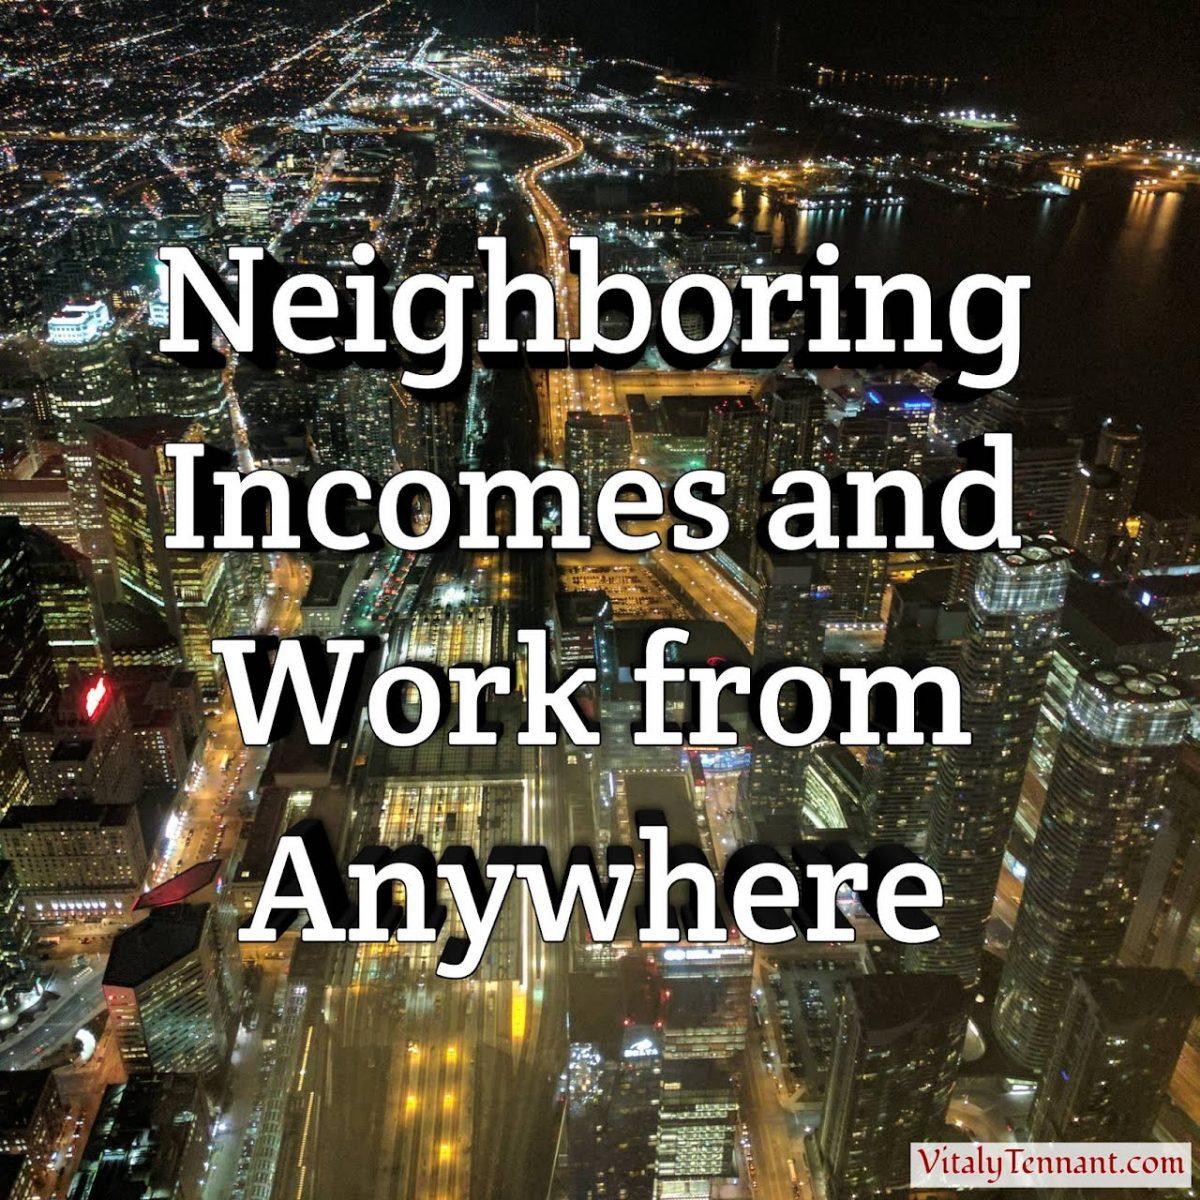 Neighboring Incomes and Work from Anywhere via Vitaly Tennant, vitalytennant.com